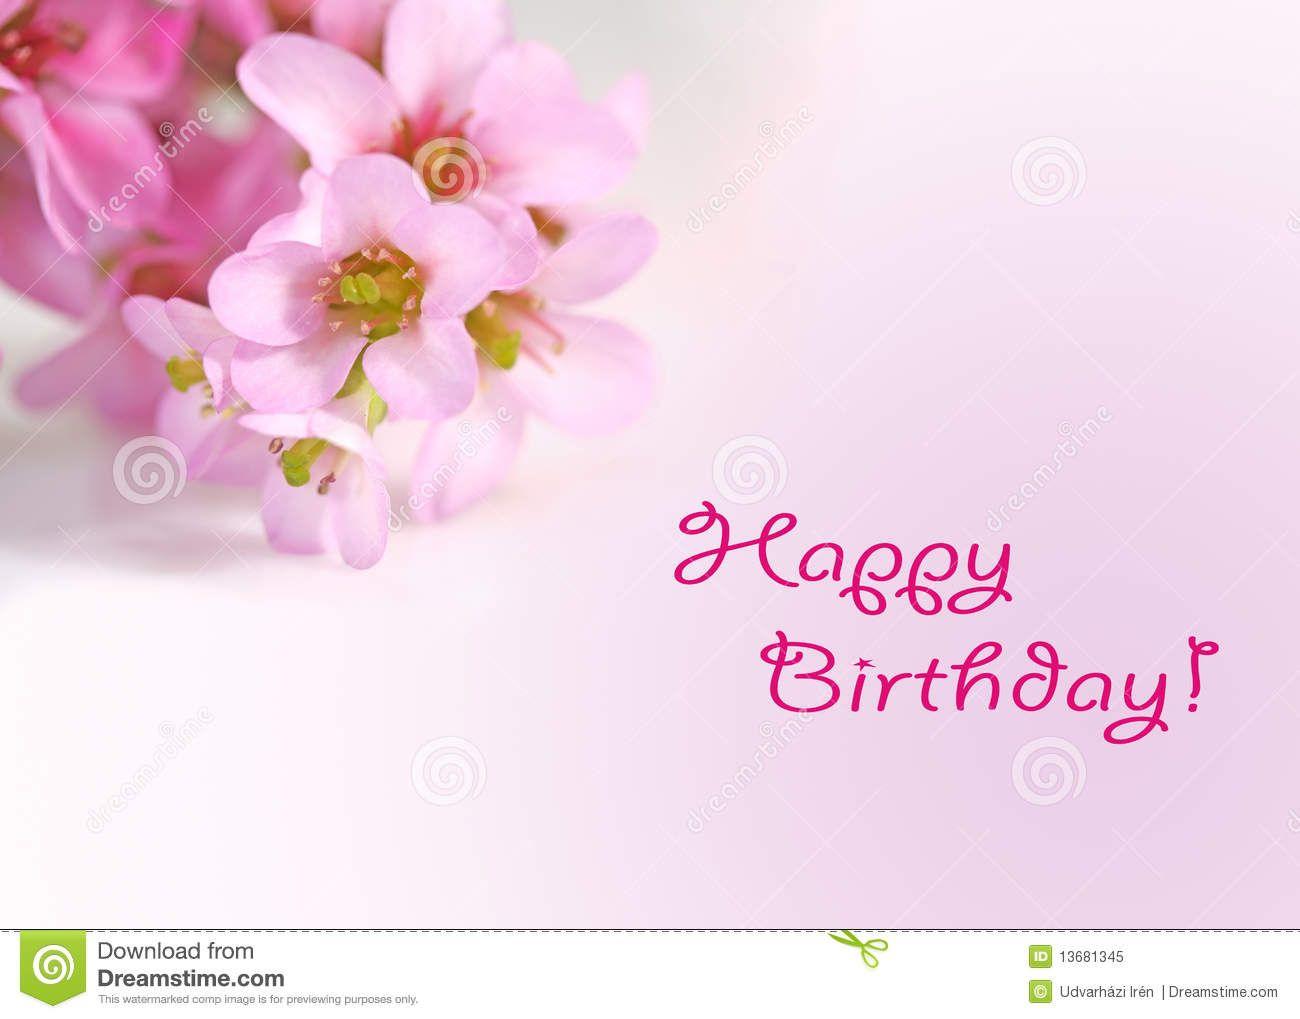 Pics For Happy Birthday Flowers Cards verjaardag Pinterest